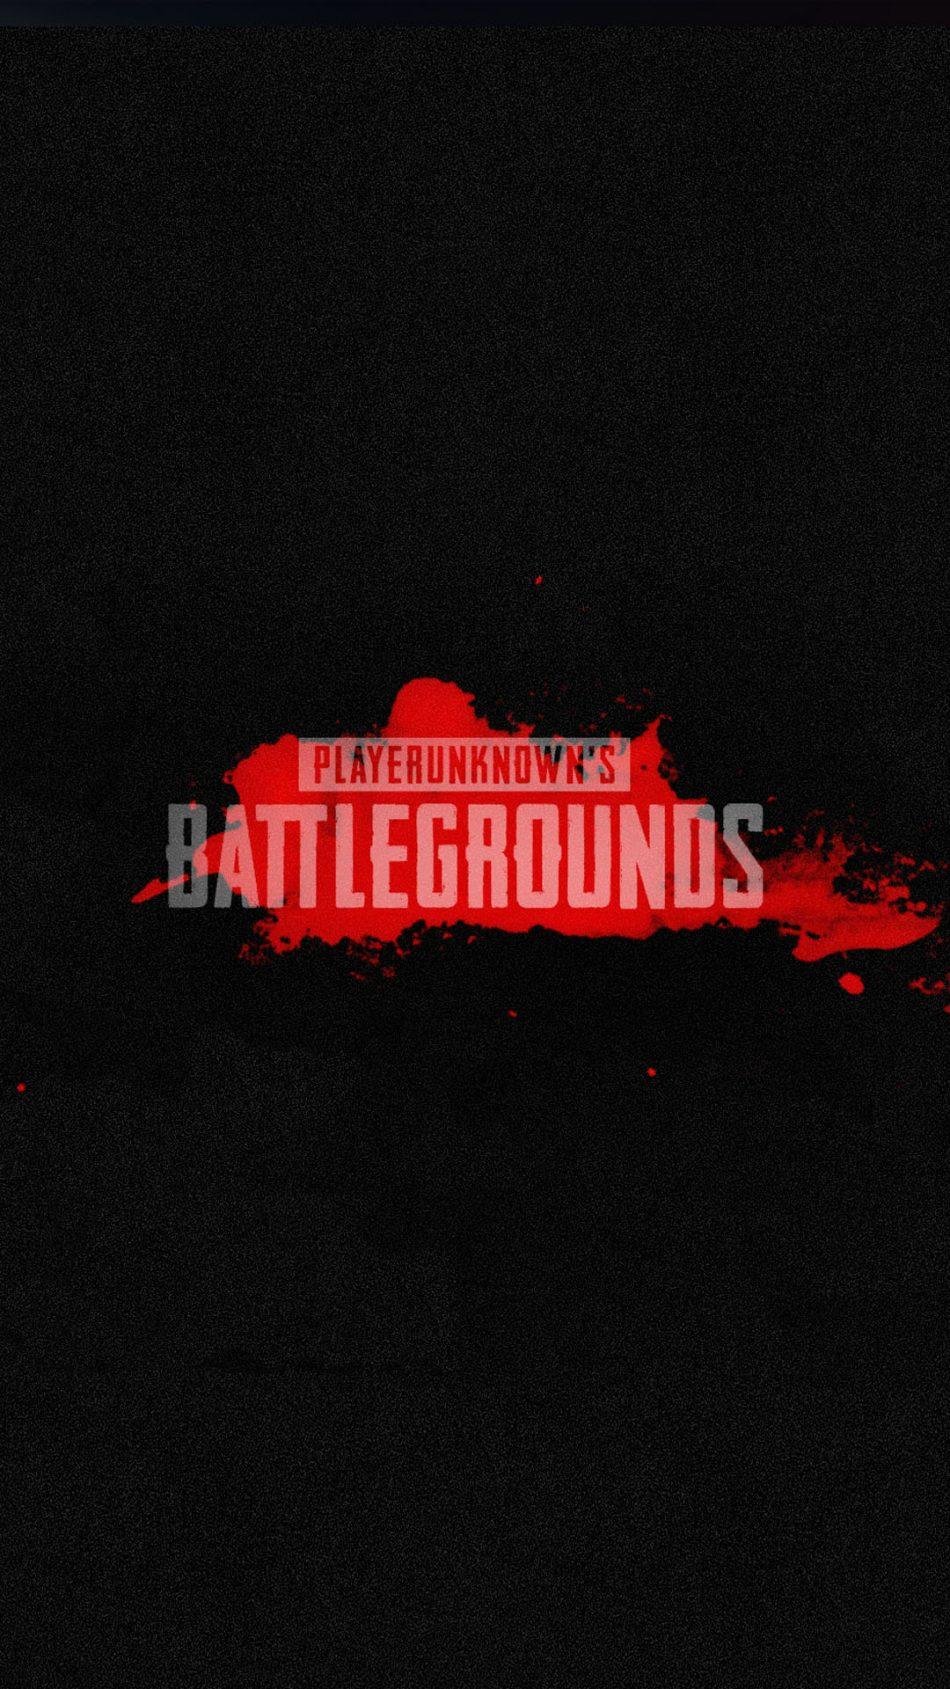 Wallpaper Off White Iphone X Download Playerunknown S Battlegrounds Pubg Minimal Free